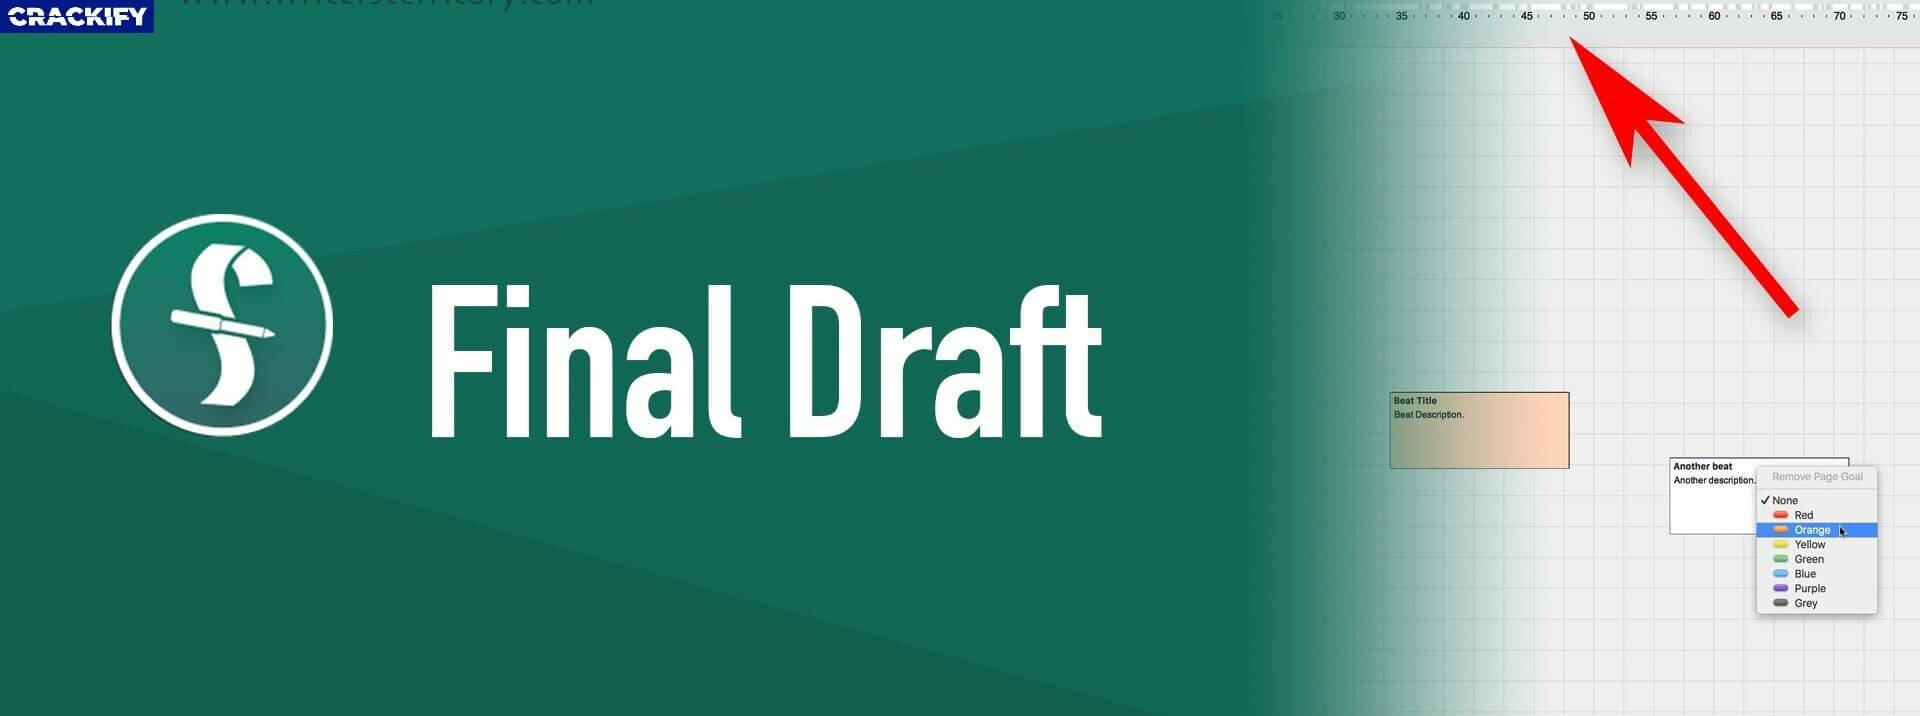 Final Draft crack + Latest Version Download